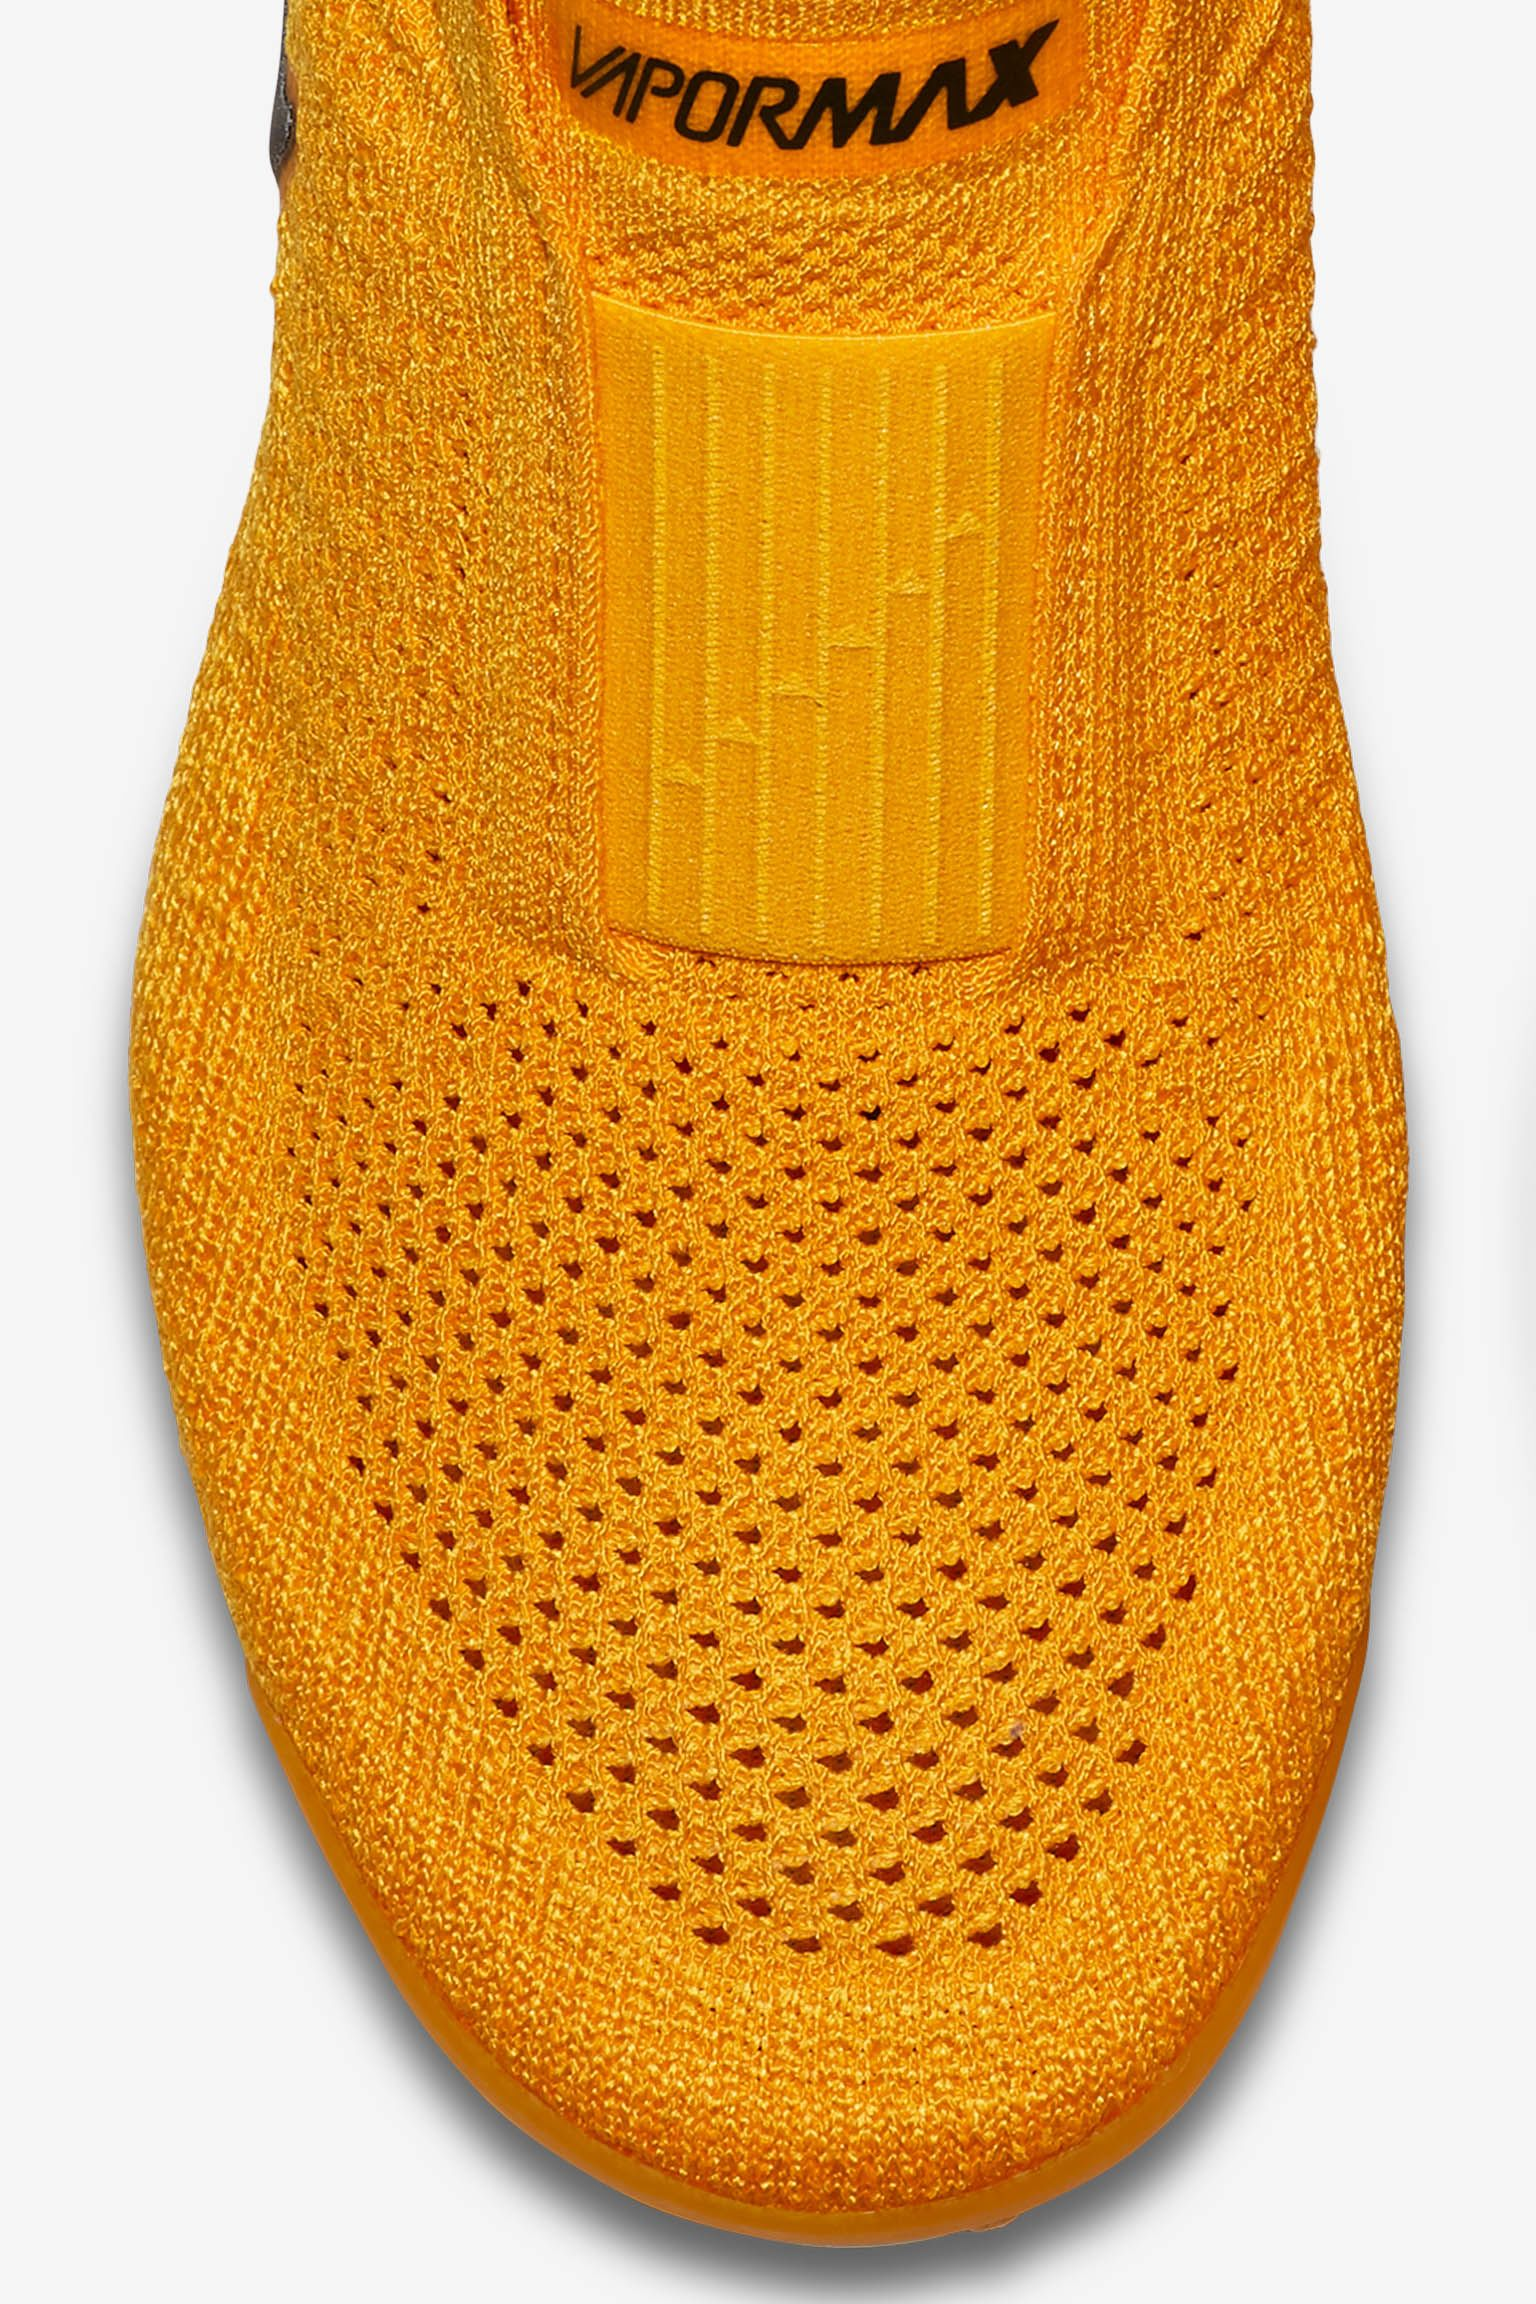 Nike Women's Air Vapormax Moc 2 'University Gold & Black' Release Date